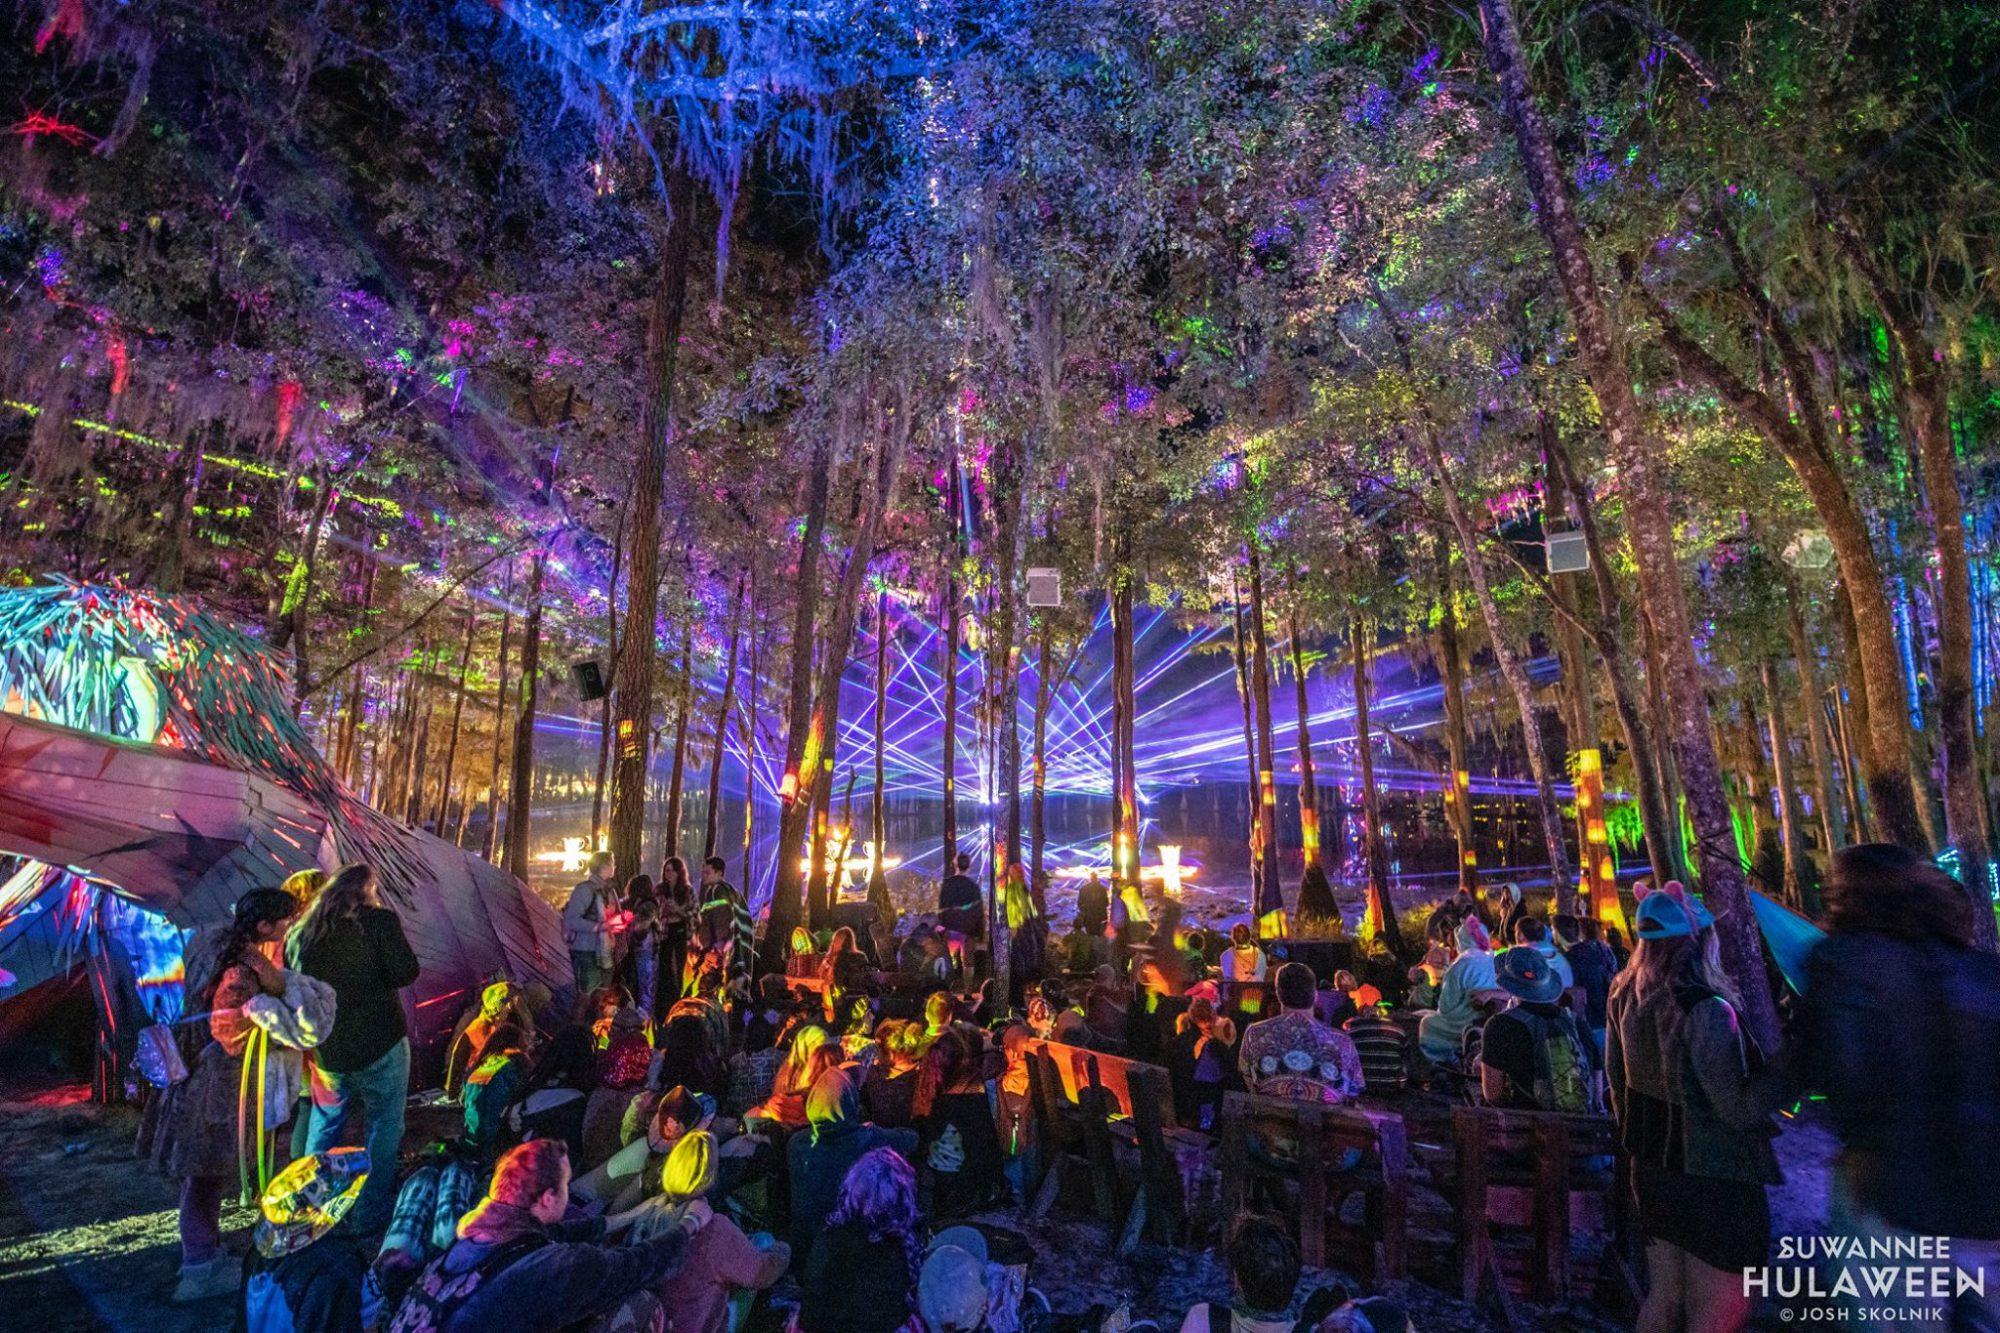 Suwannee Hulaween, fesitval, camping, rave